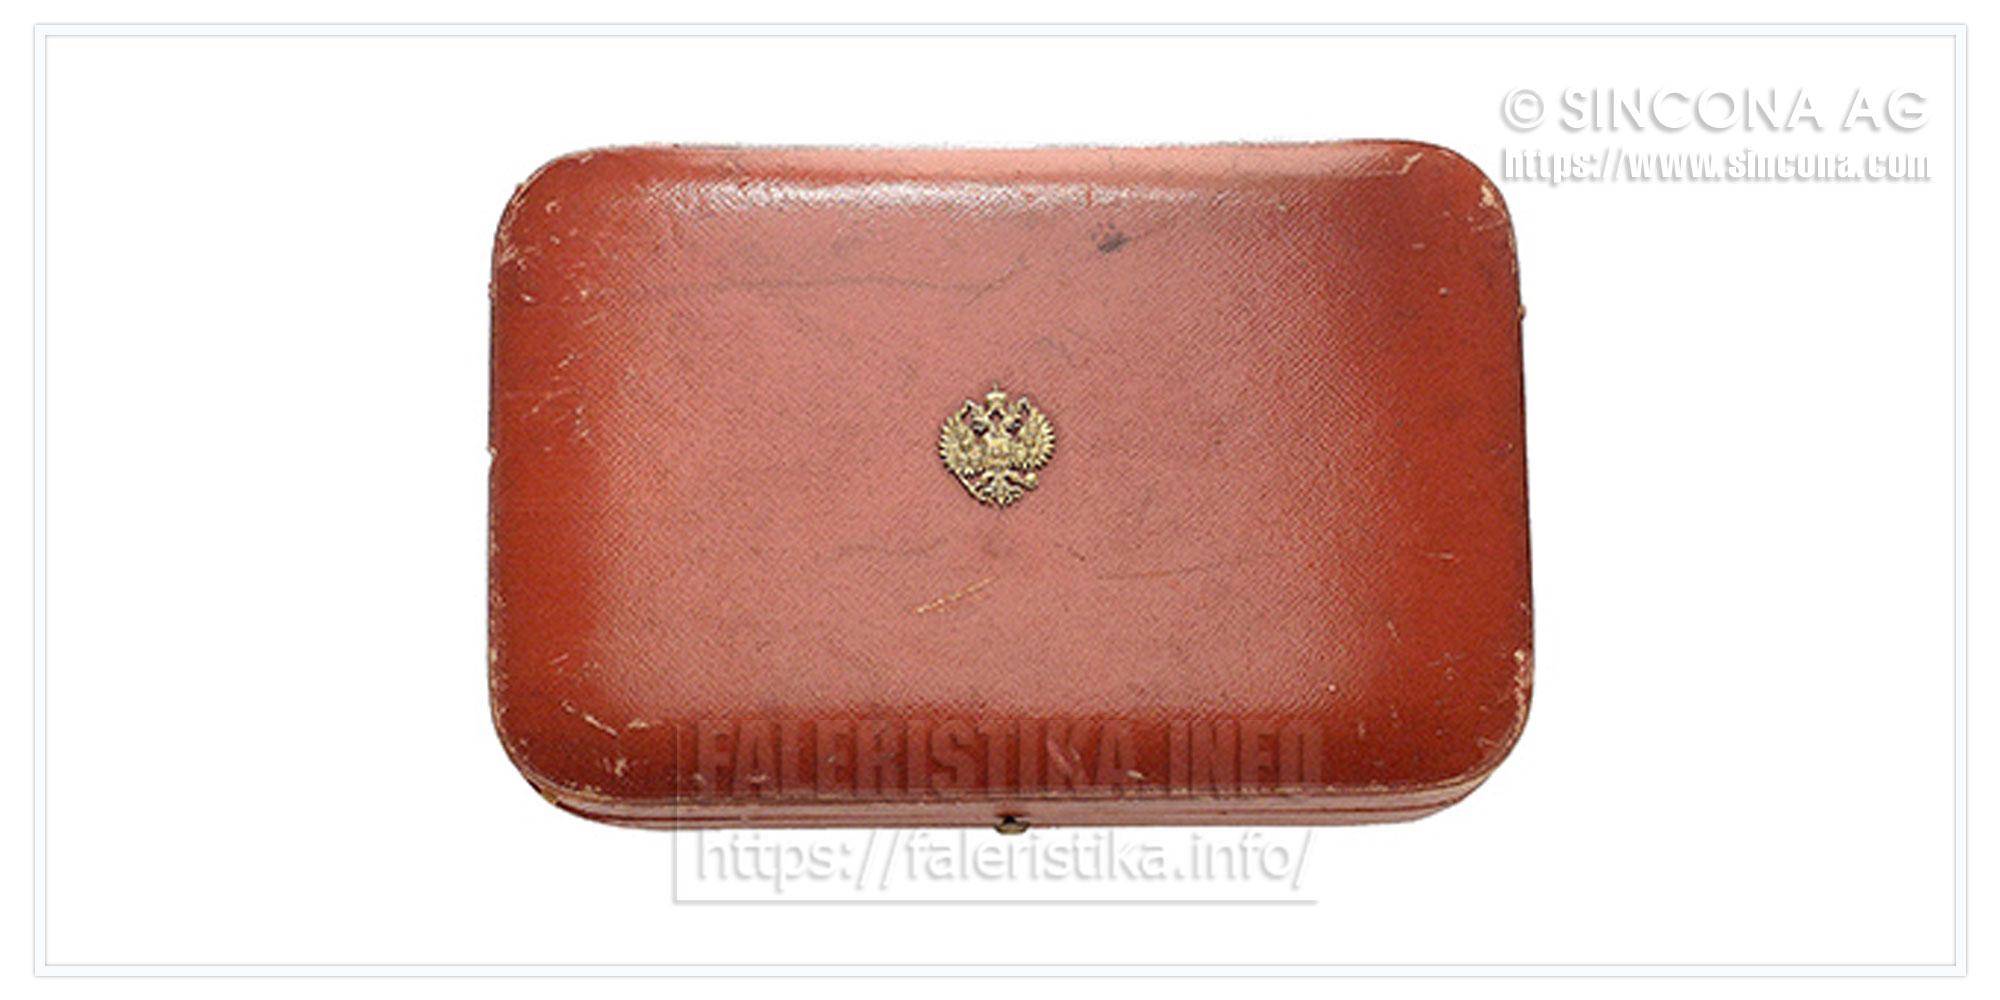 Коробка для знаков ордена Святого Александра Невского